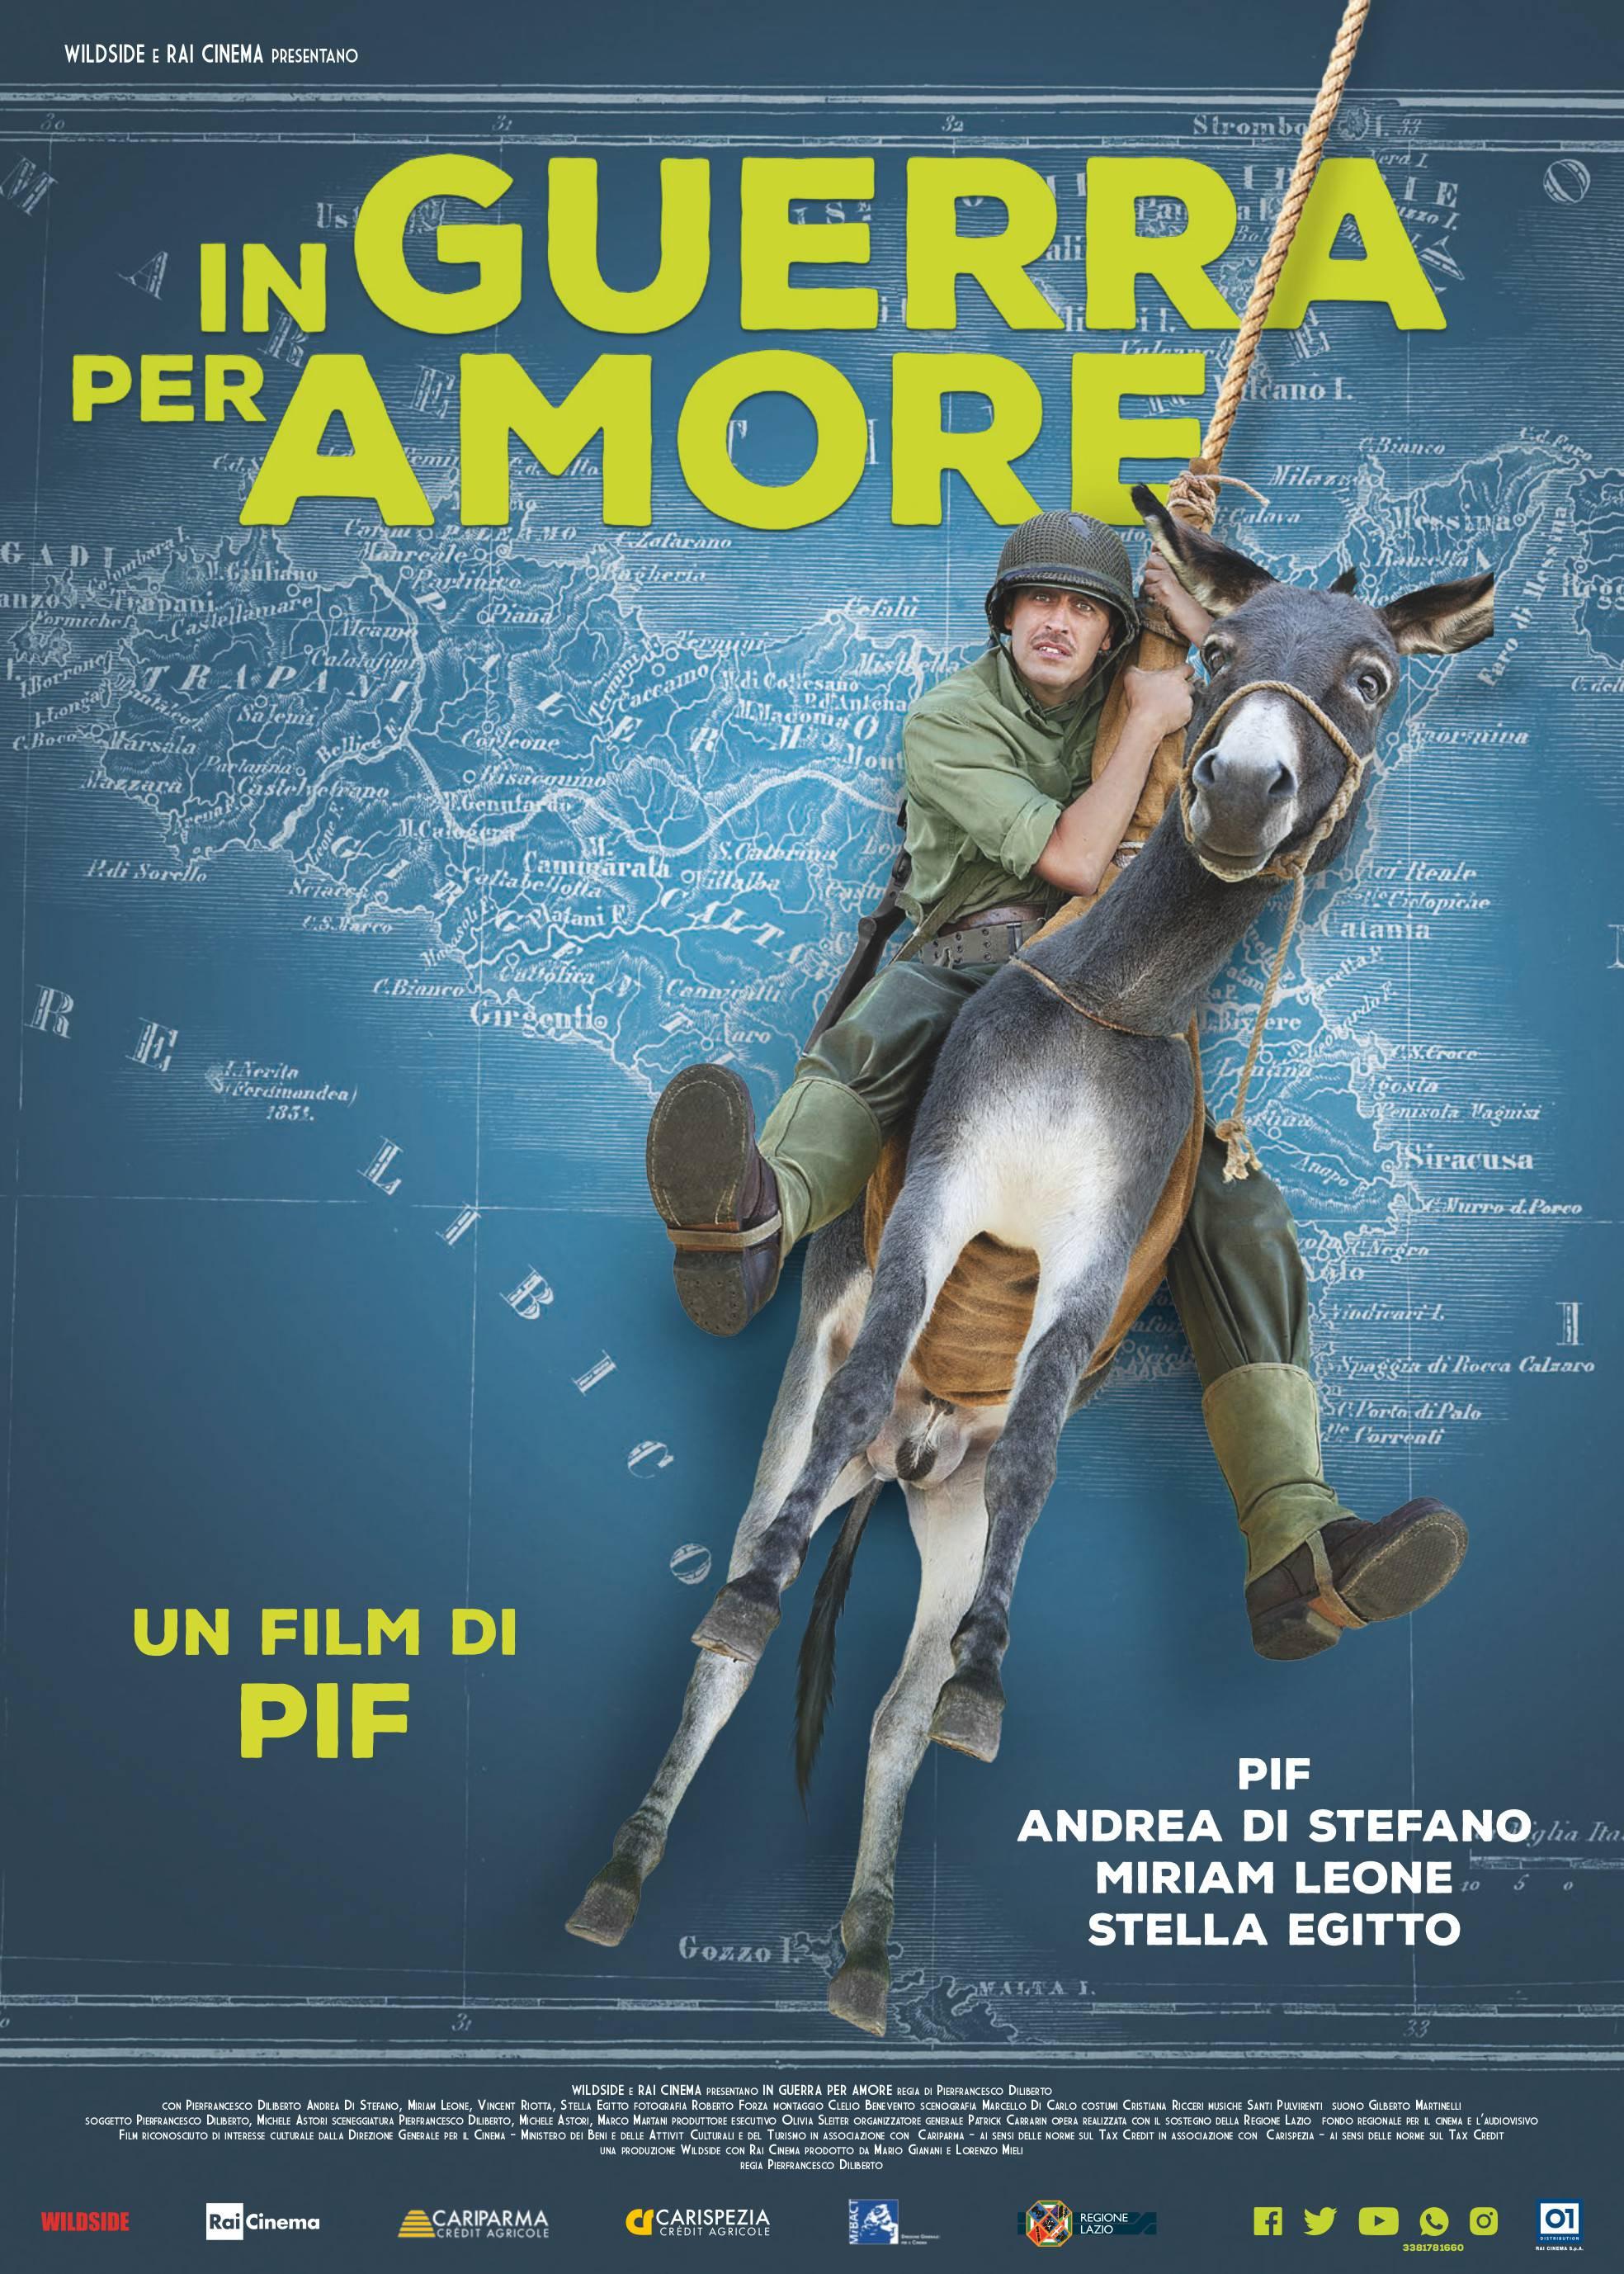 In guerra per amore streaming online [PUNIQRANDLINE-(au-dating-names.txt) 59